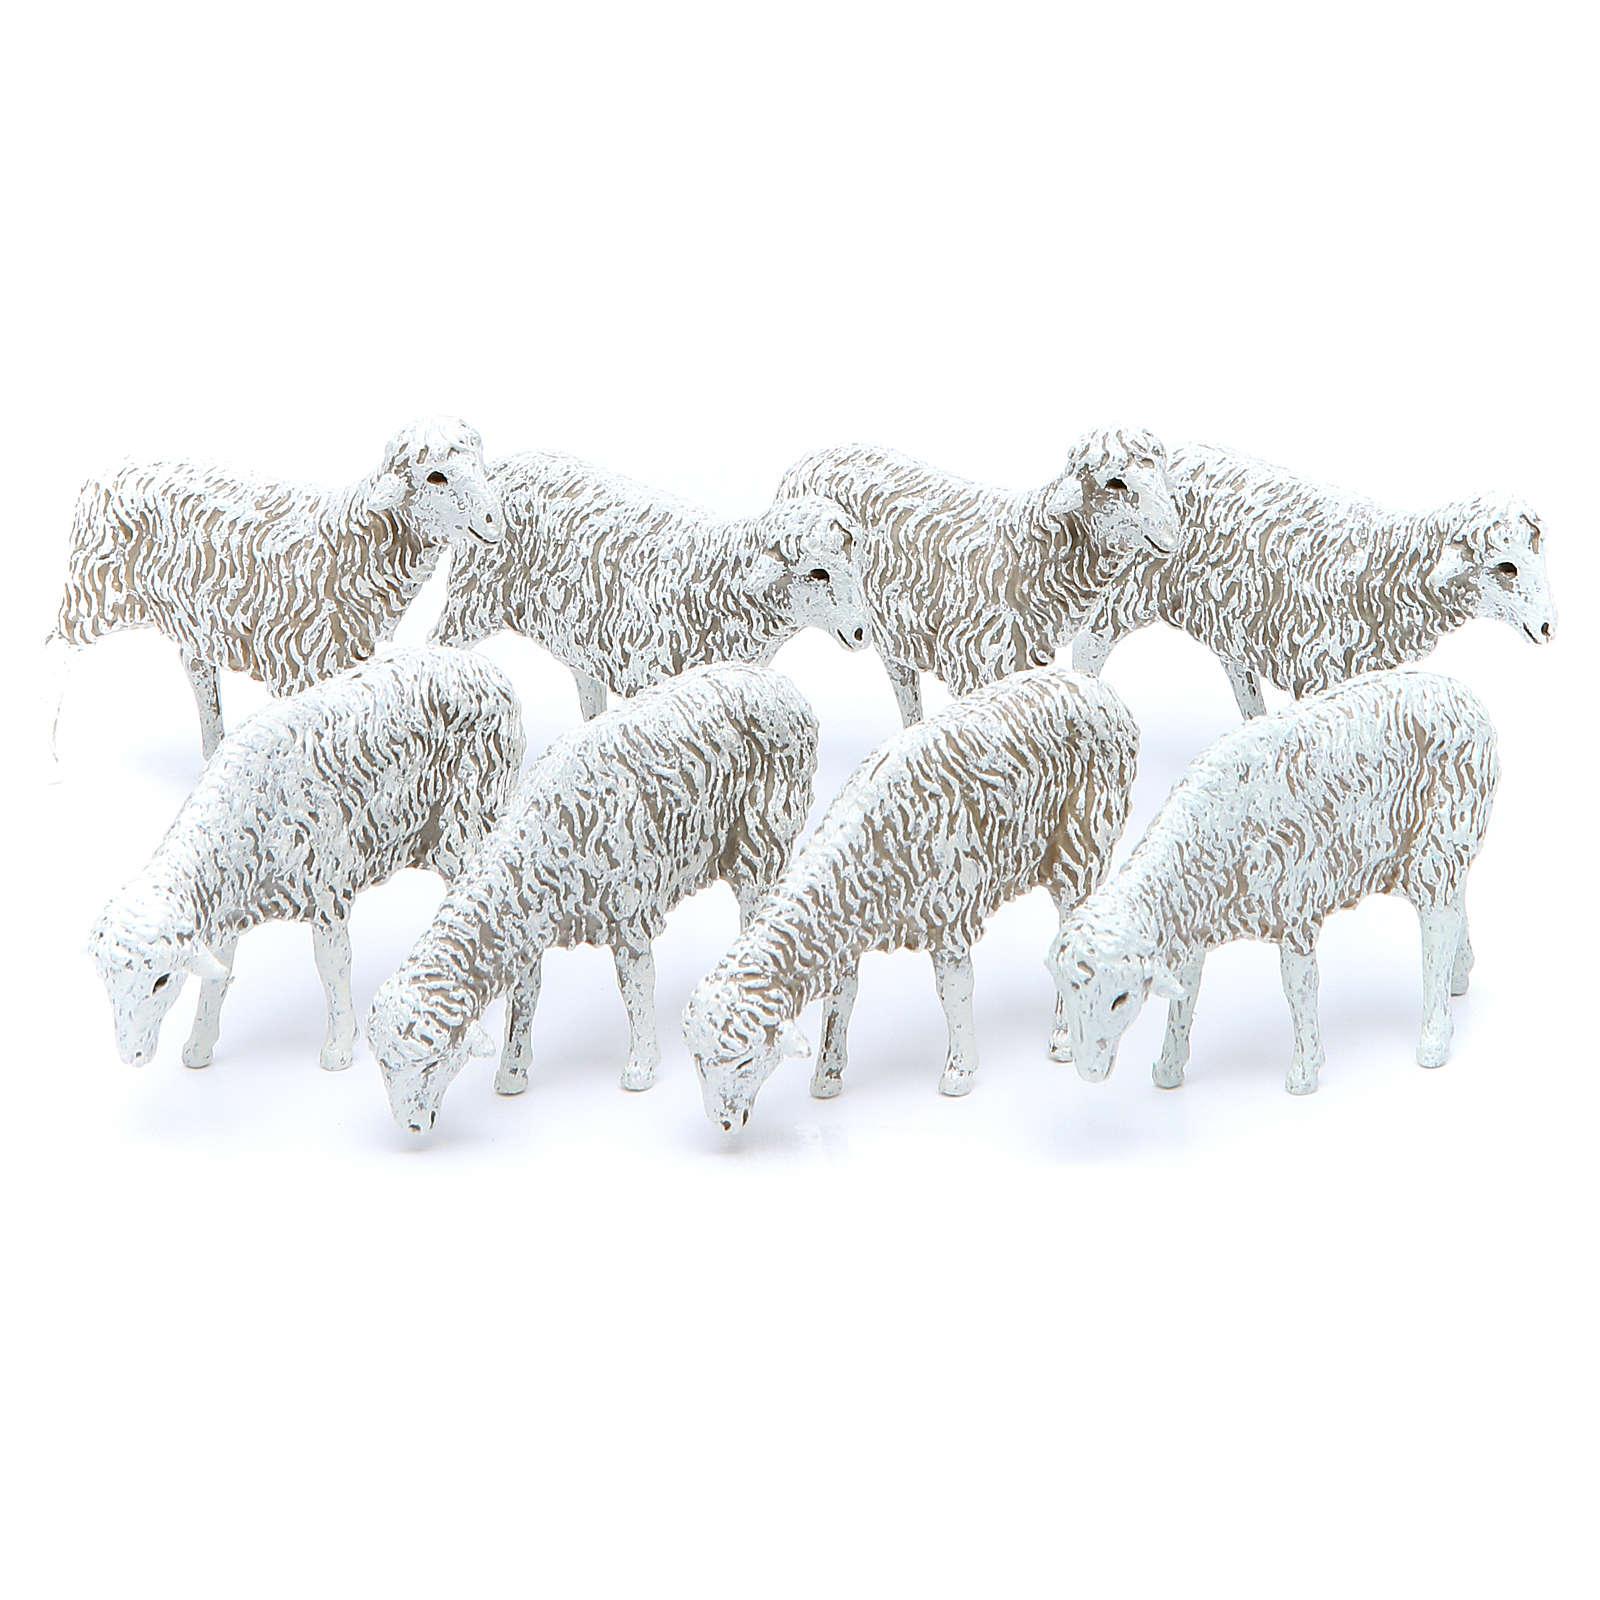 Moutons 12 crèche Moranduzzo 4